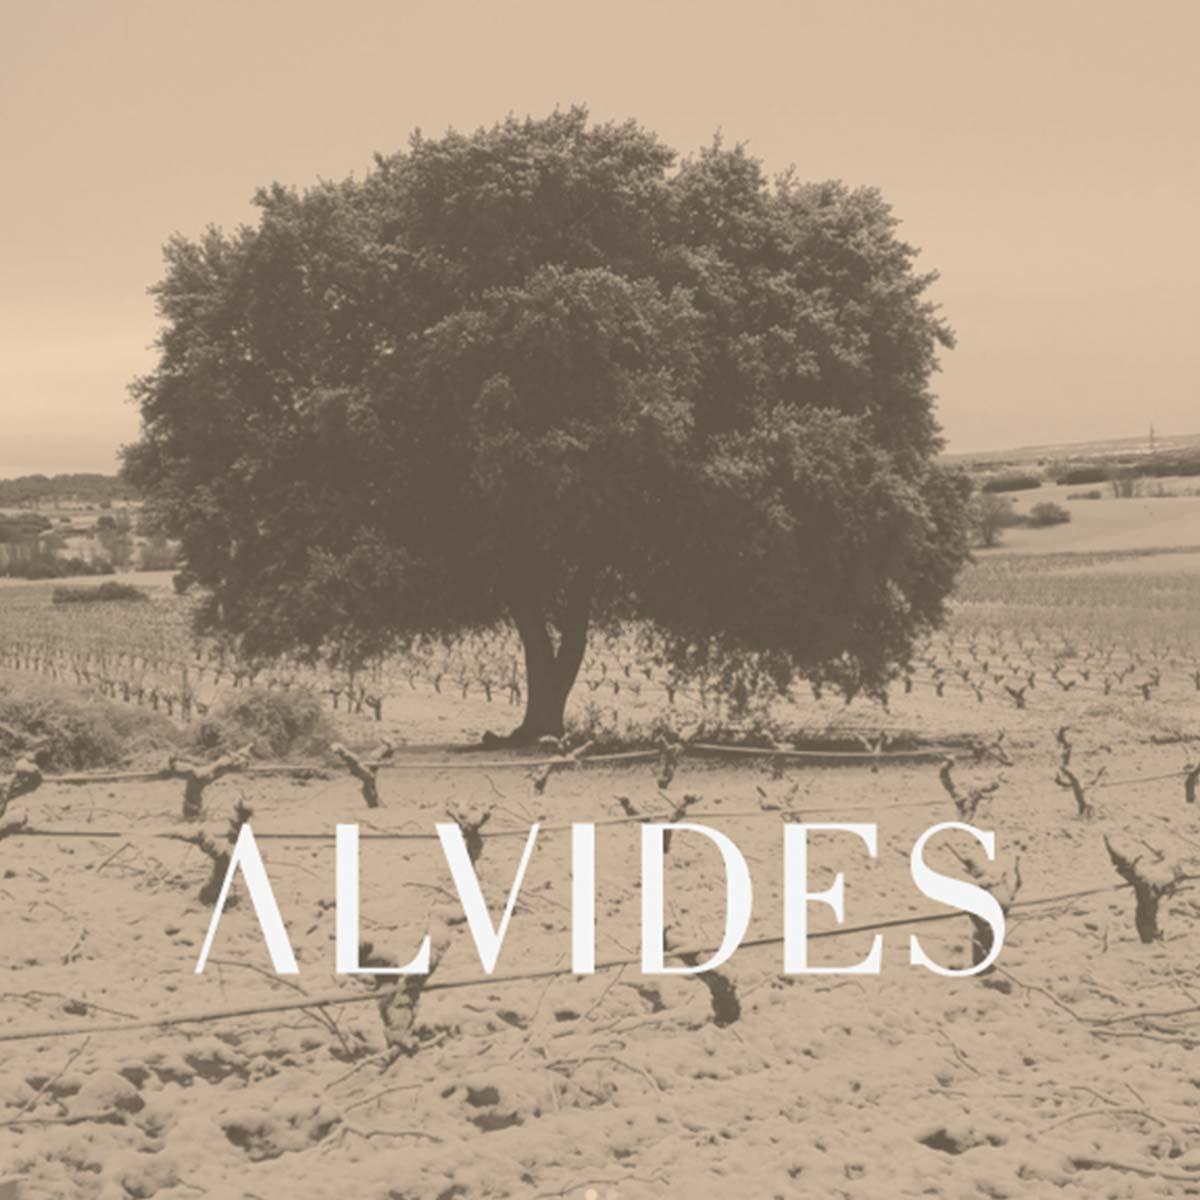 Alvides